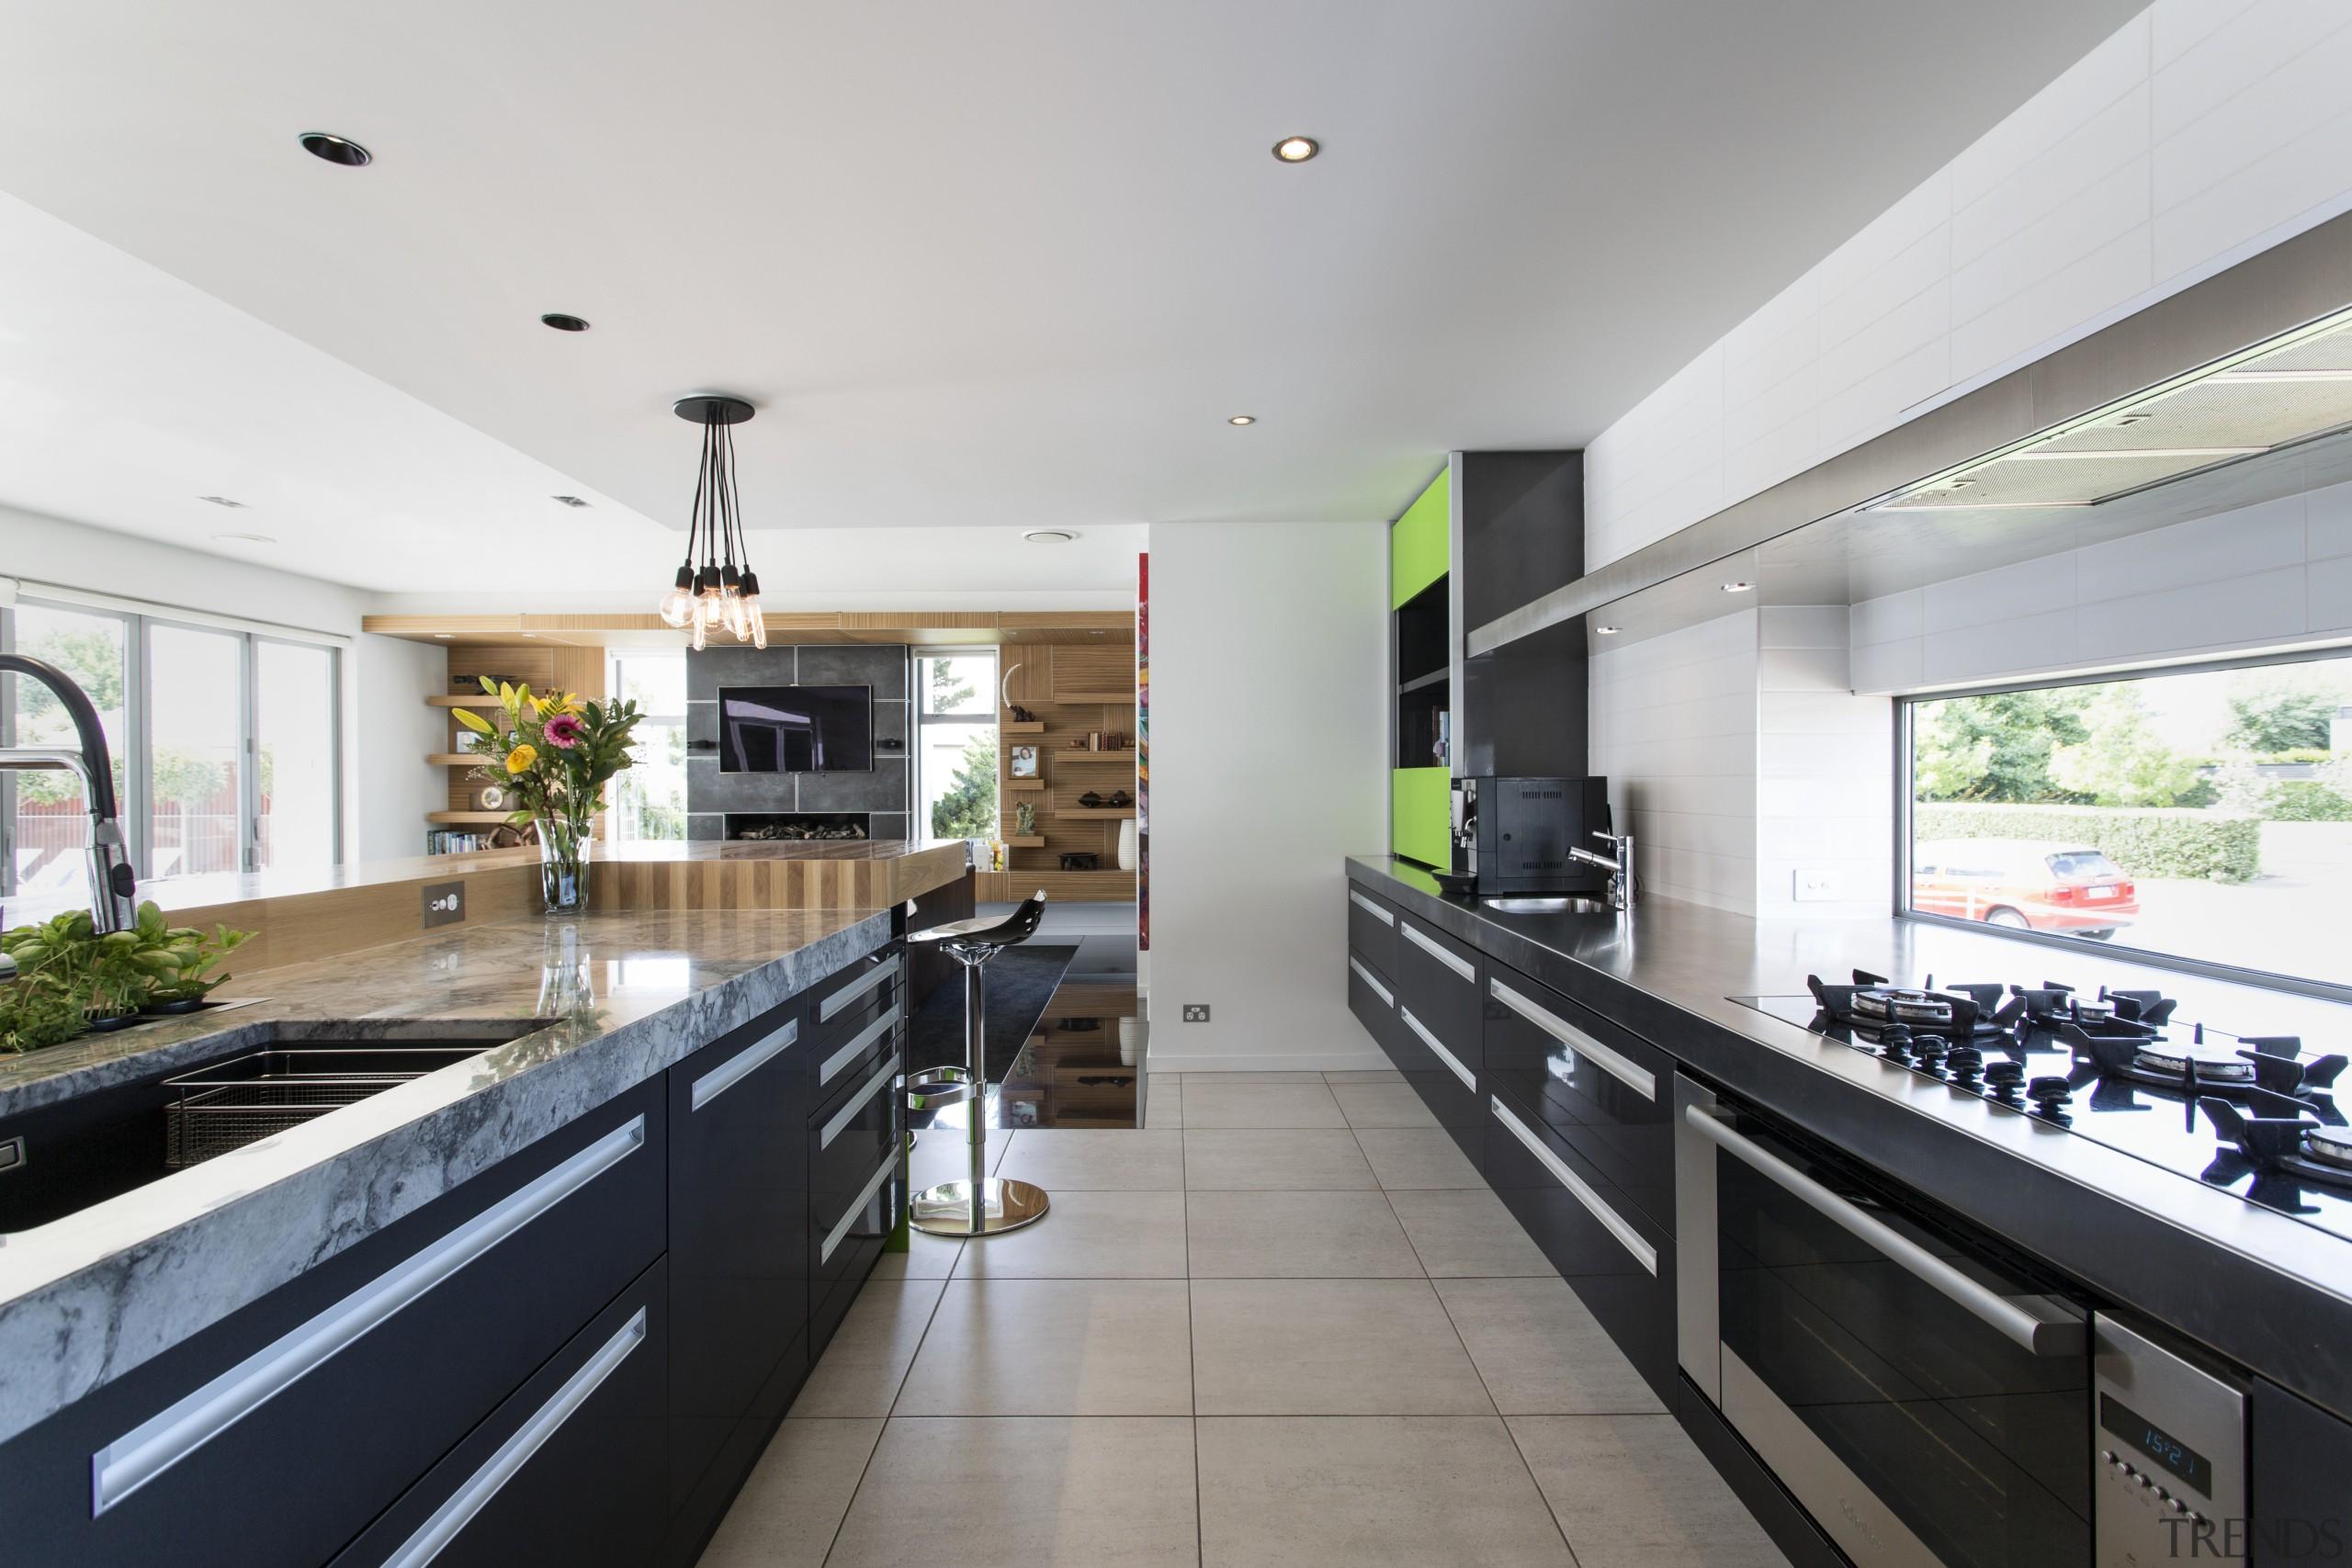 Storage aplenty  a bank of deep under-counter countertop, interior design, kitchen, real estate, white, gray